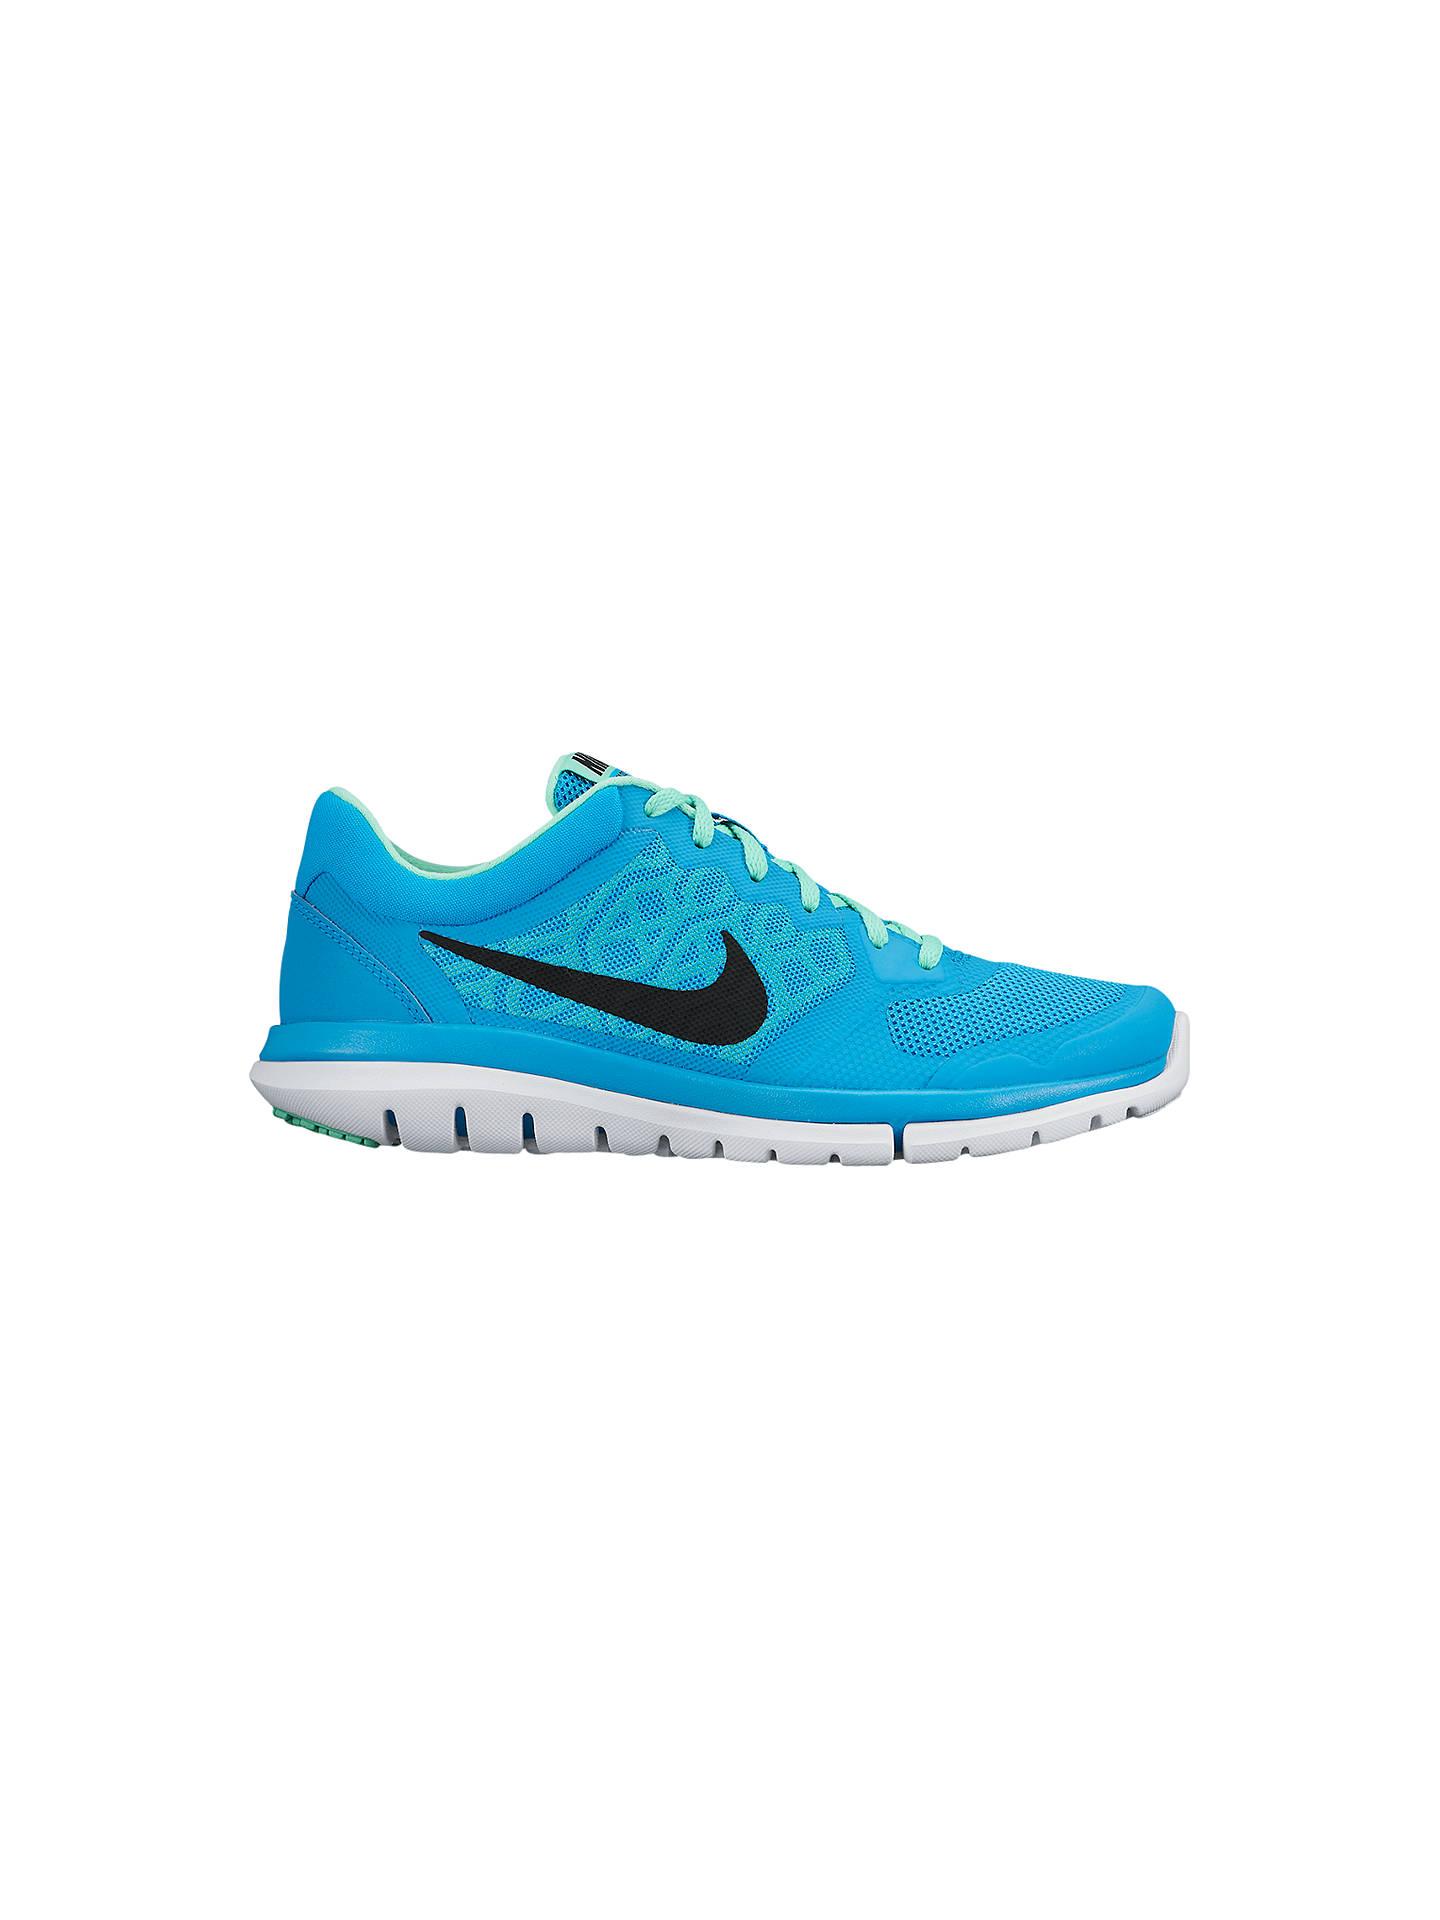 34954dc1fe2 Nike Flex Run 2015 Women s Running Shoes at John Lewis   Partners